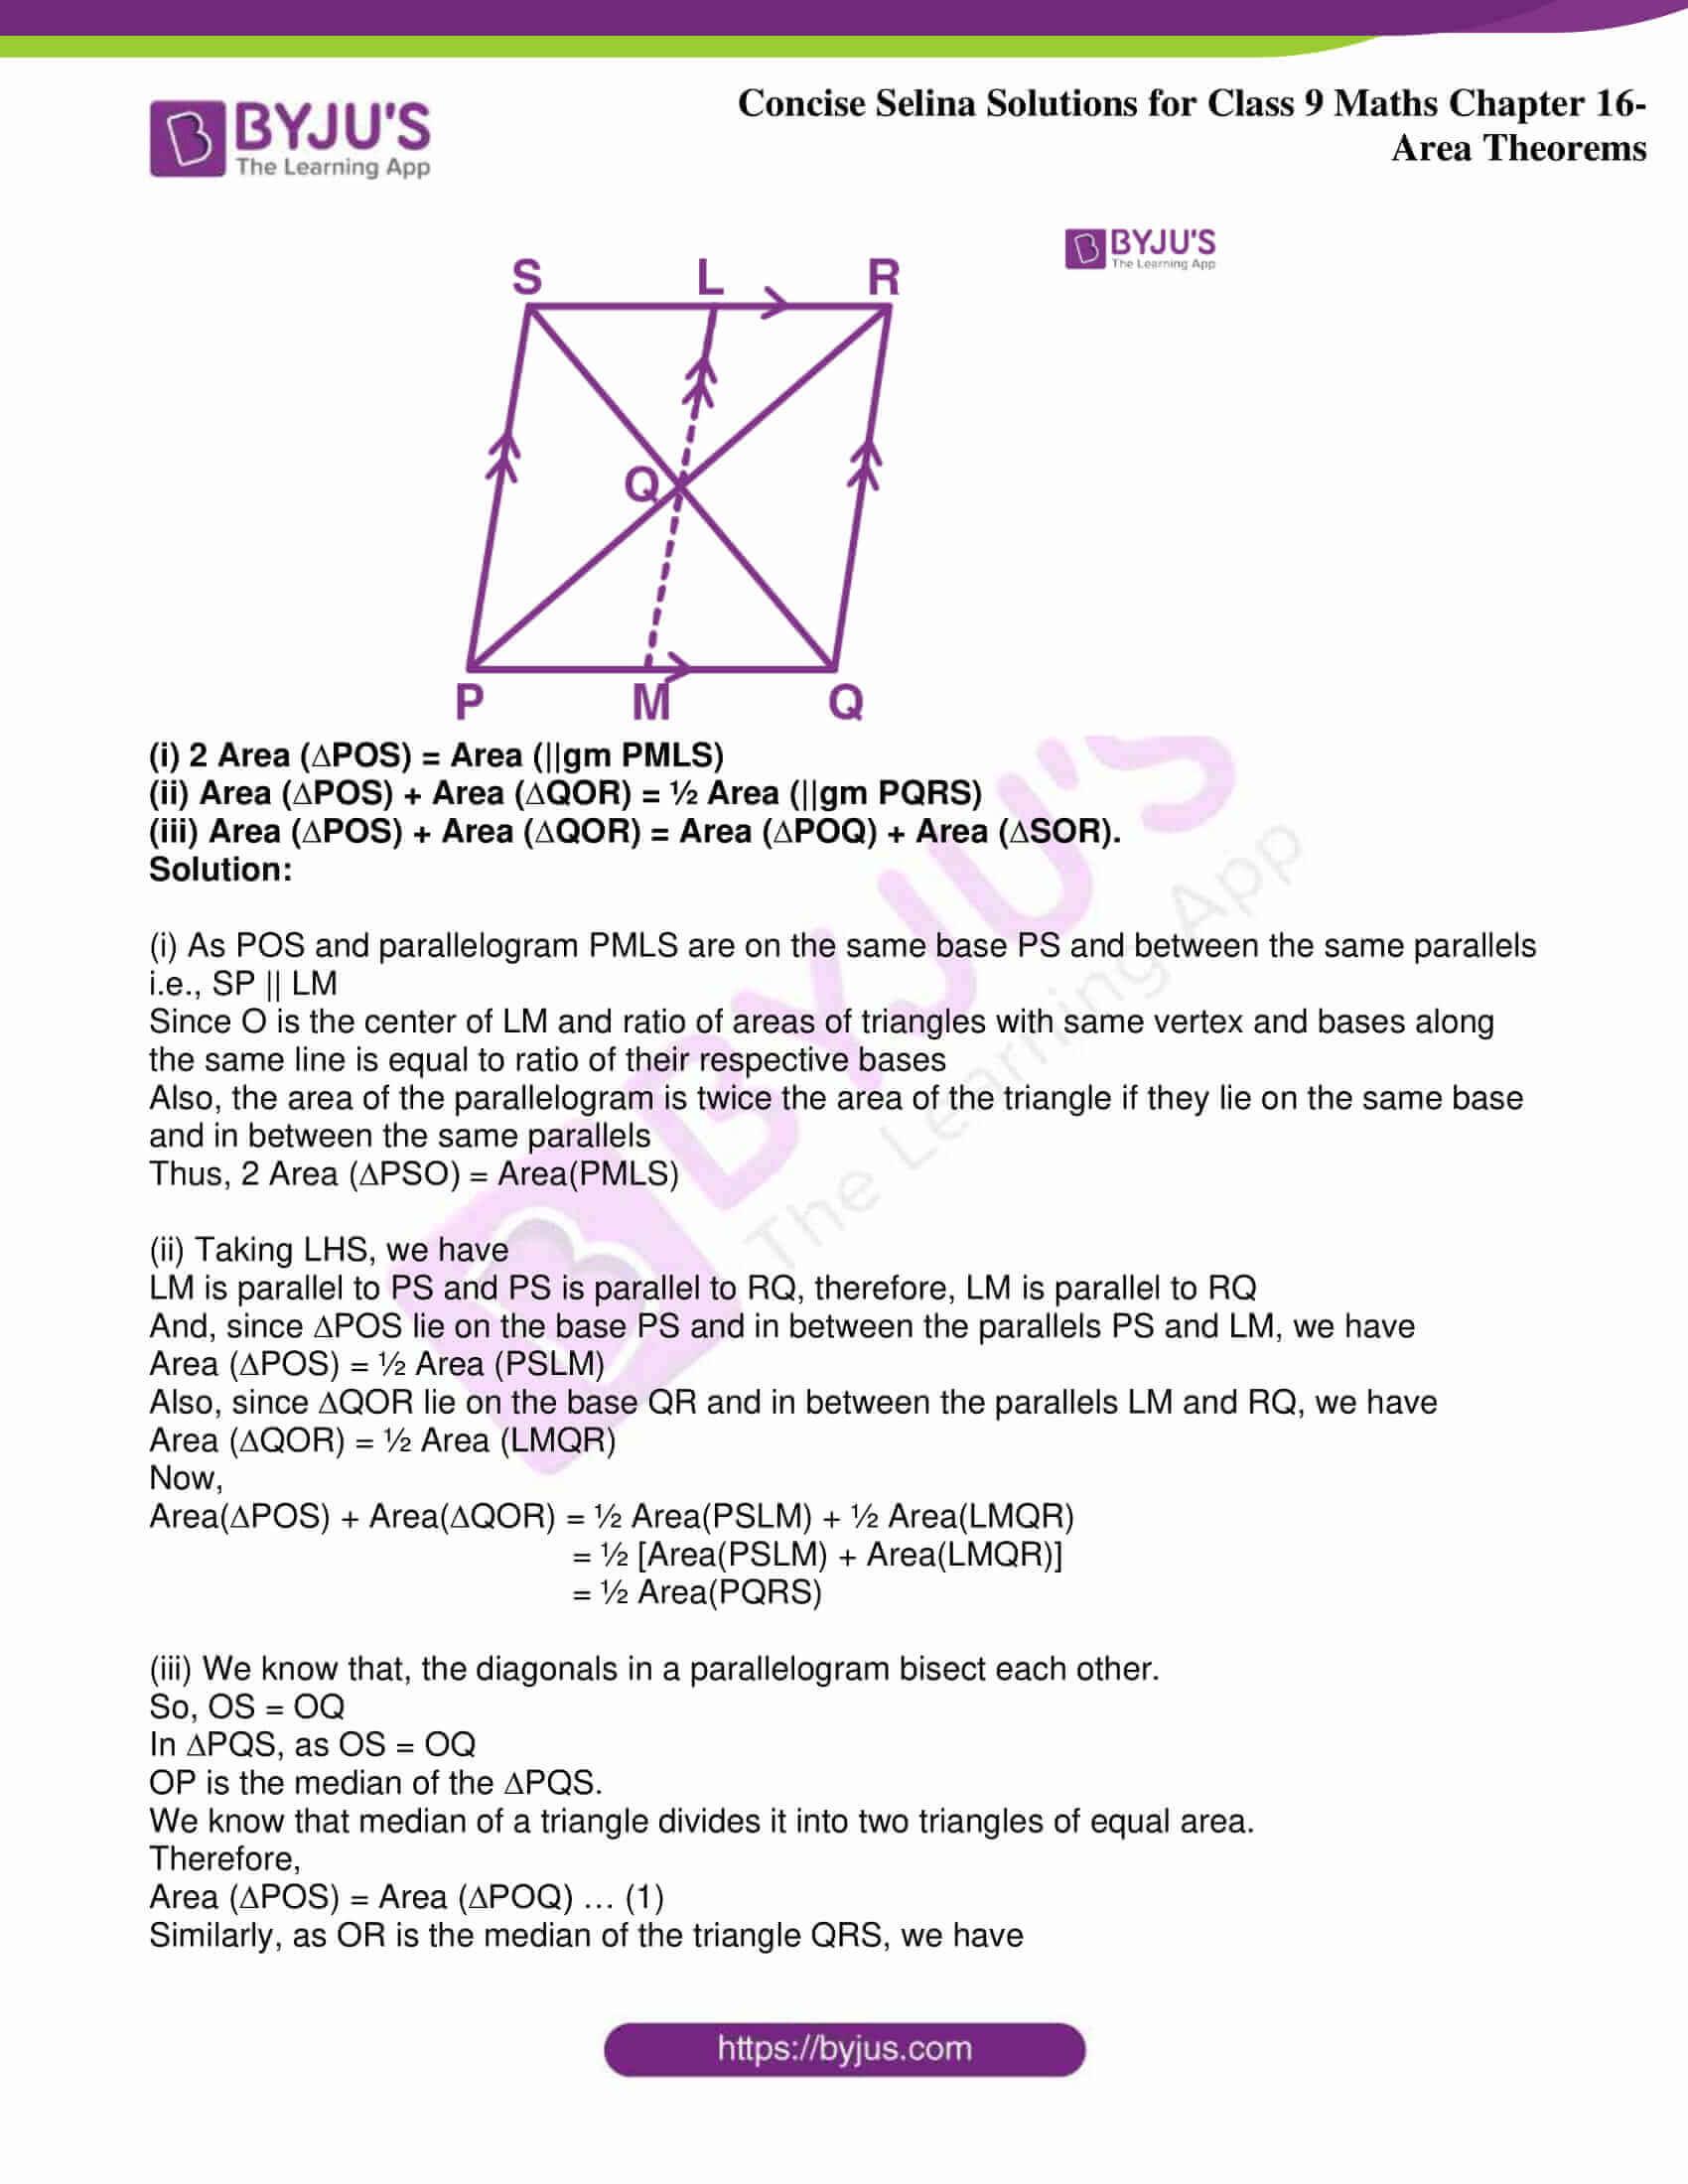 icse class 9 jun9 maths selina solutions chapter 16 area theorems 03